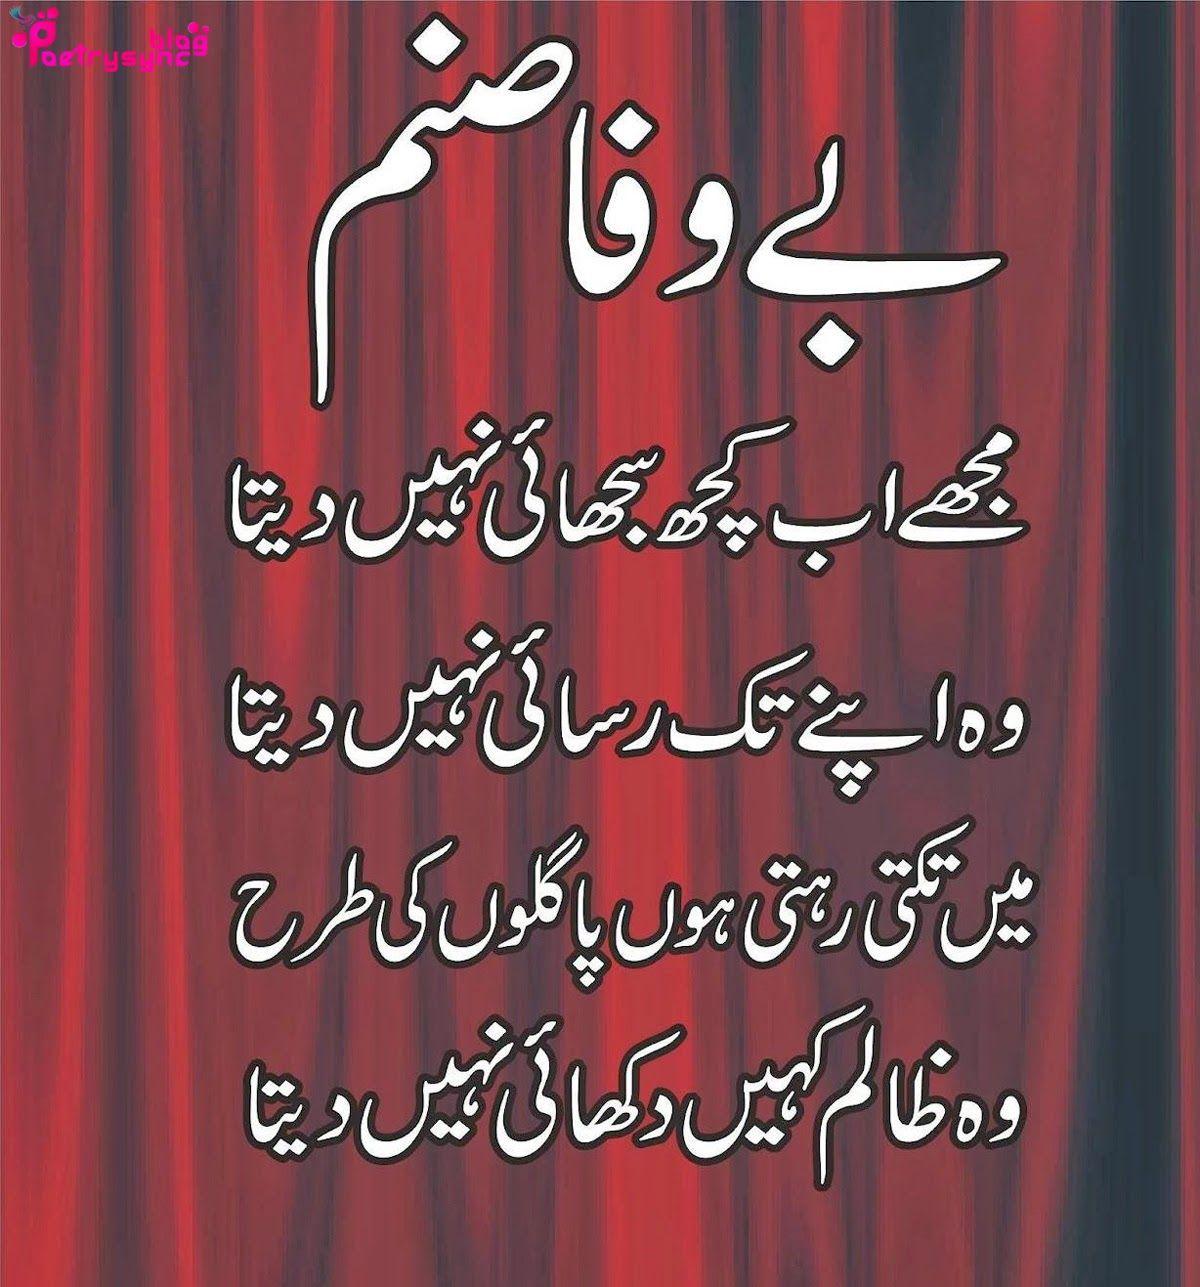 Poetry Bewafai Shayari in Urdu Design s Collection